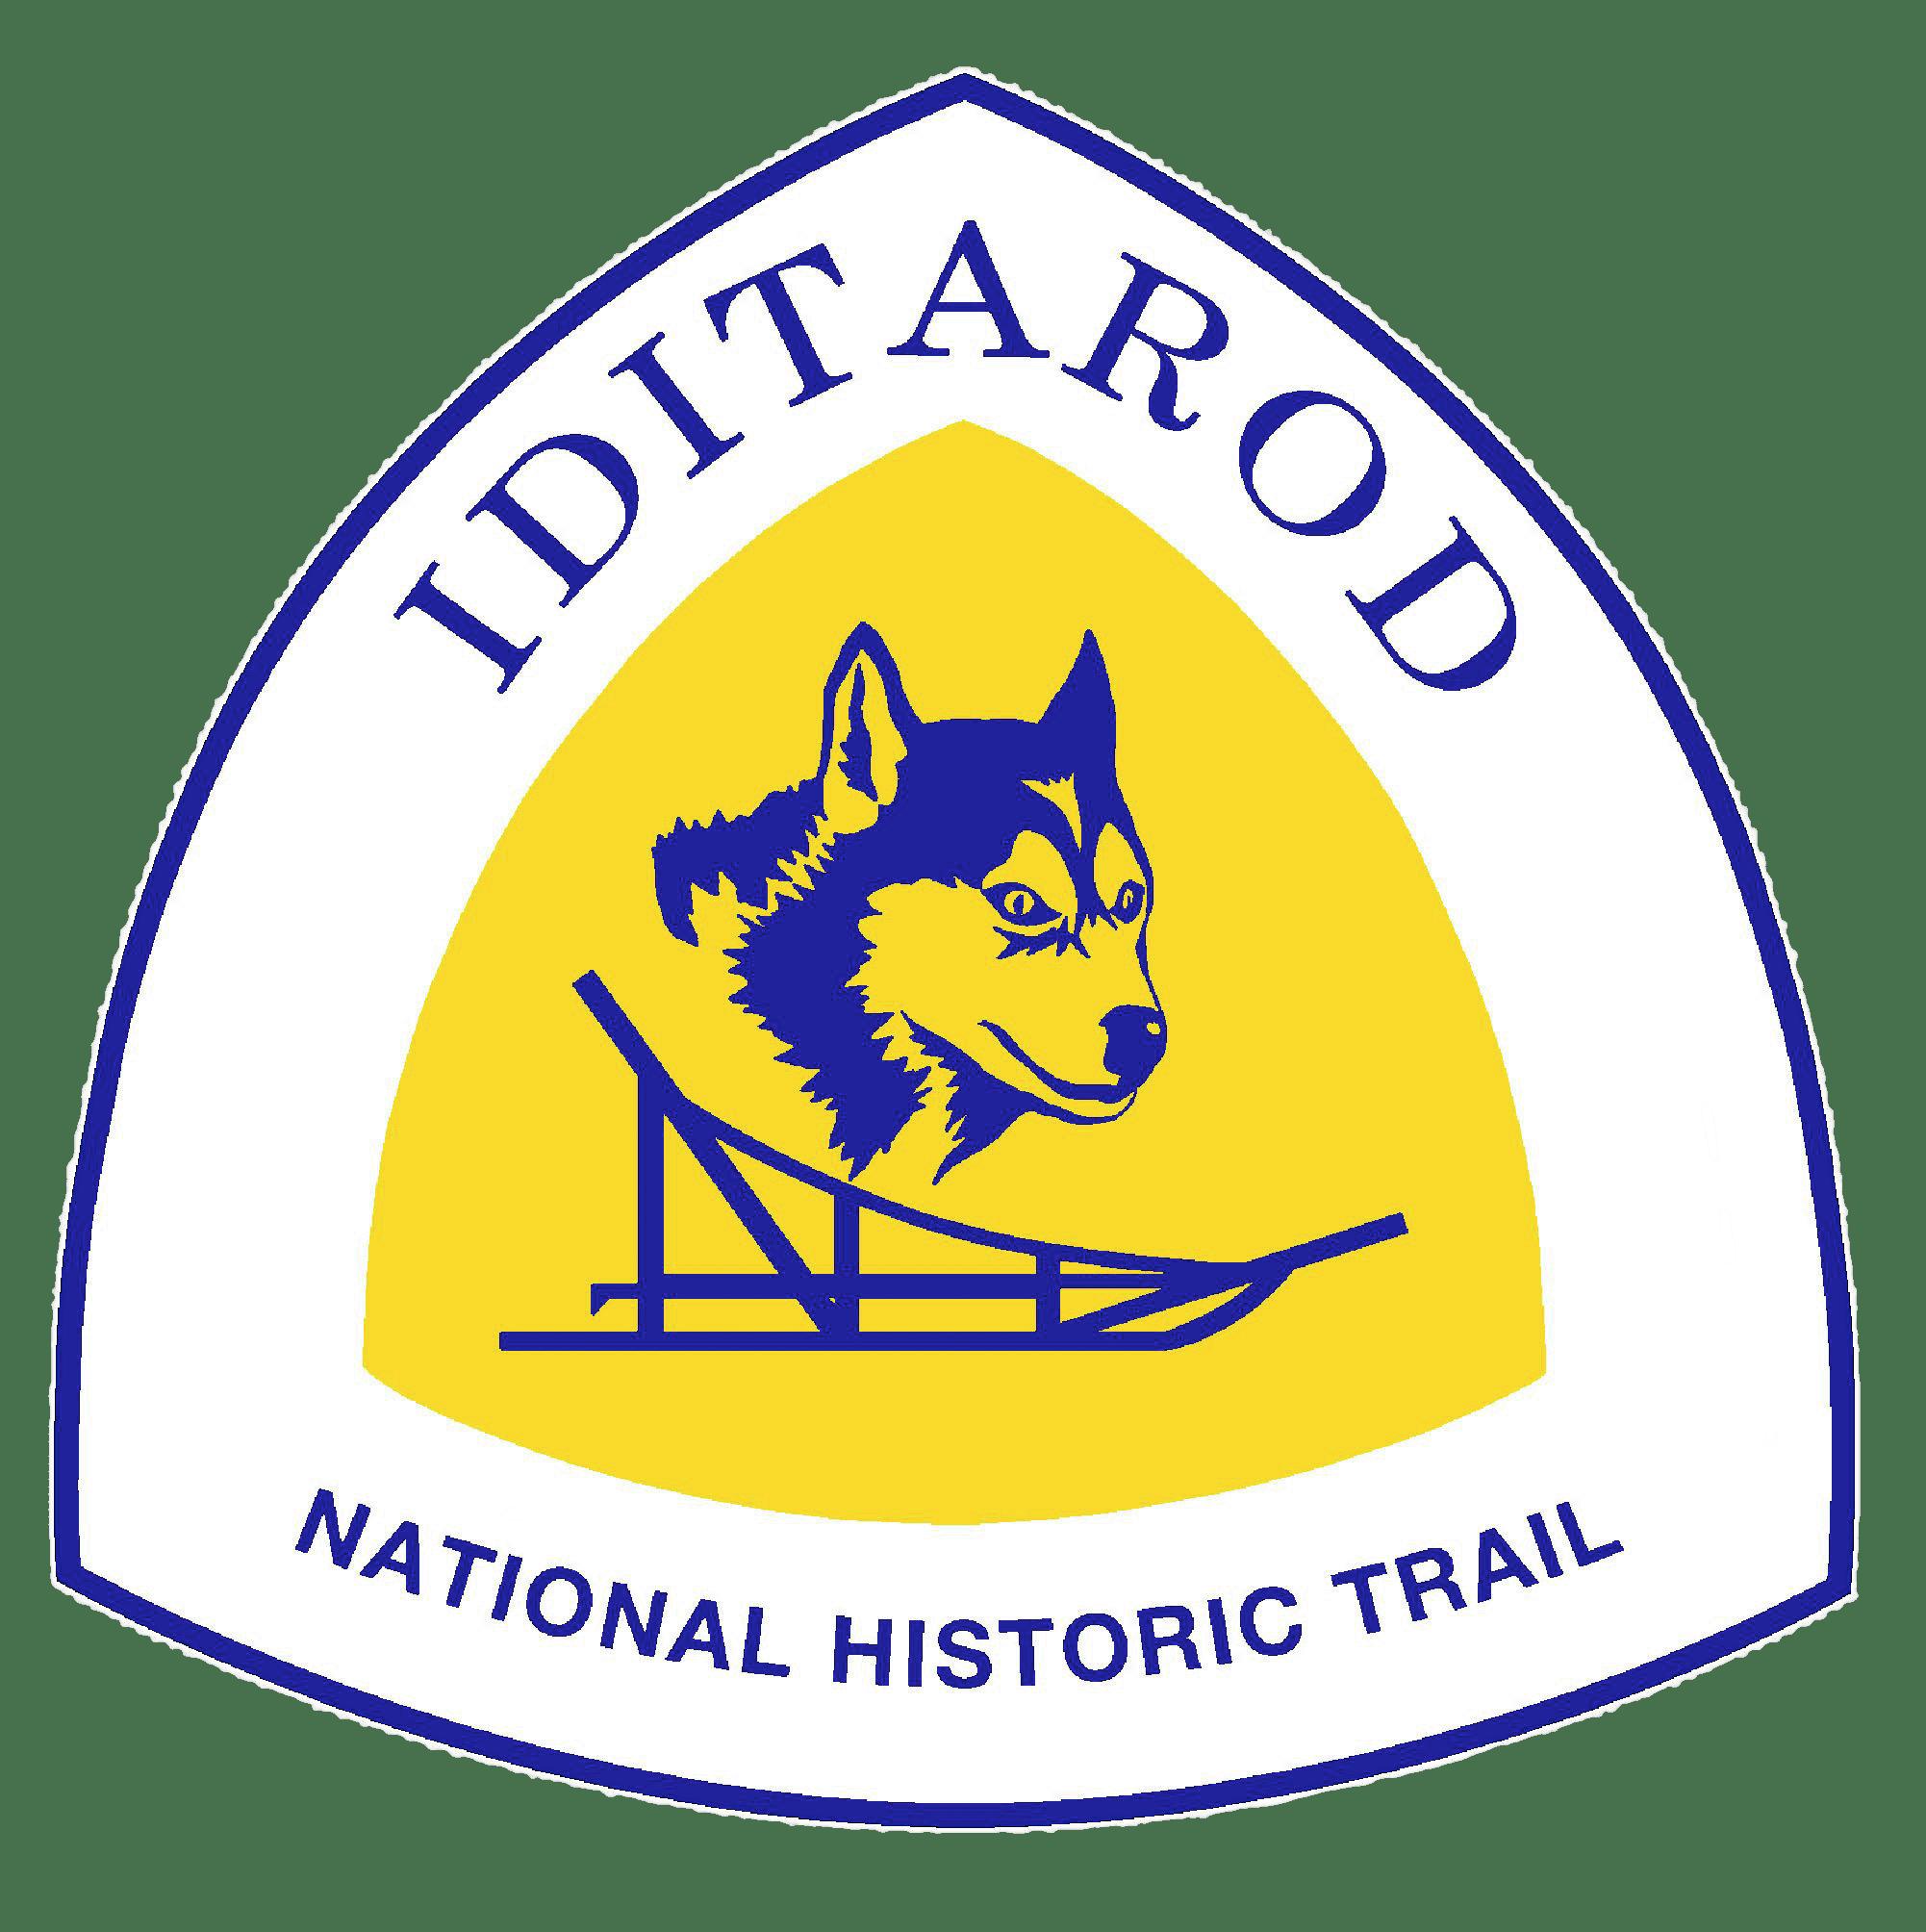 Trail clipart transparent. Iditarod national historic logo